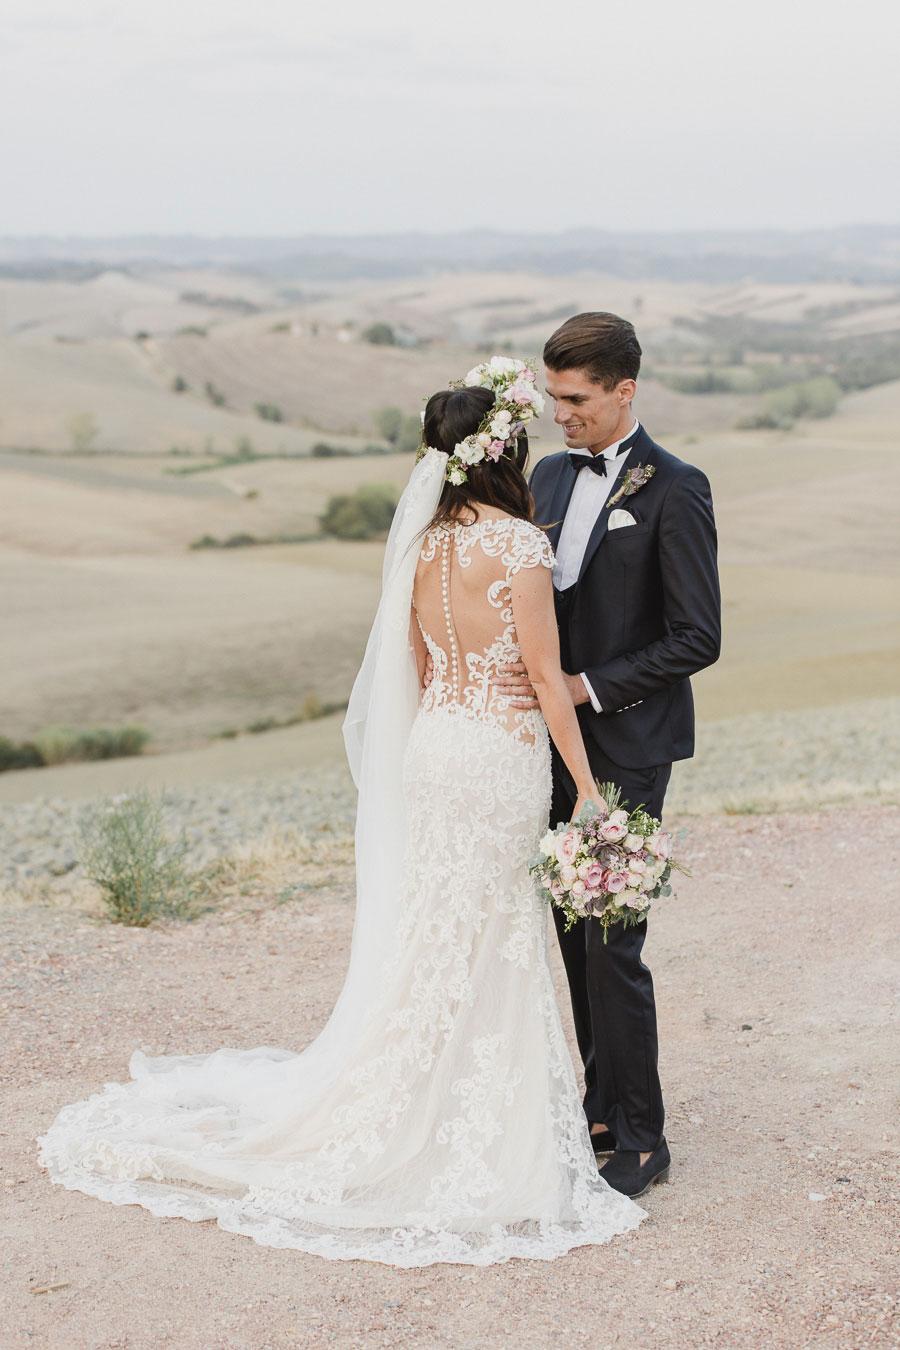 Wedding-Nicholad-and-Federica-Giuseppe-Giovannelli-168